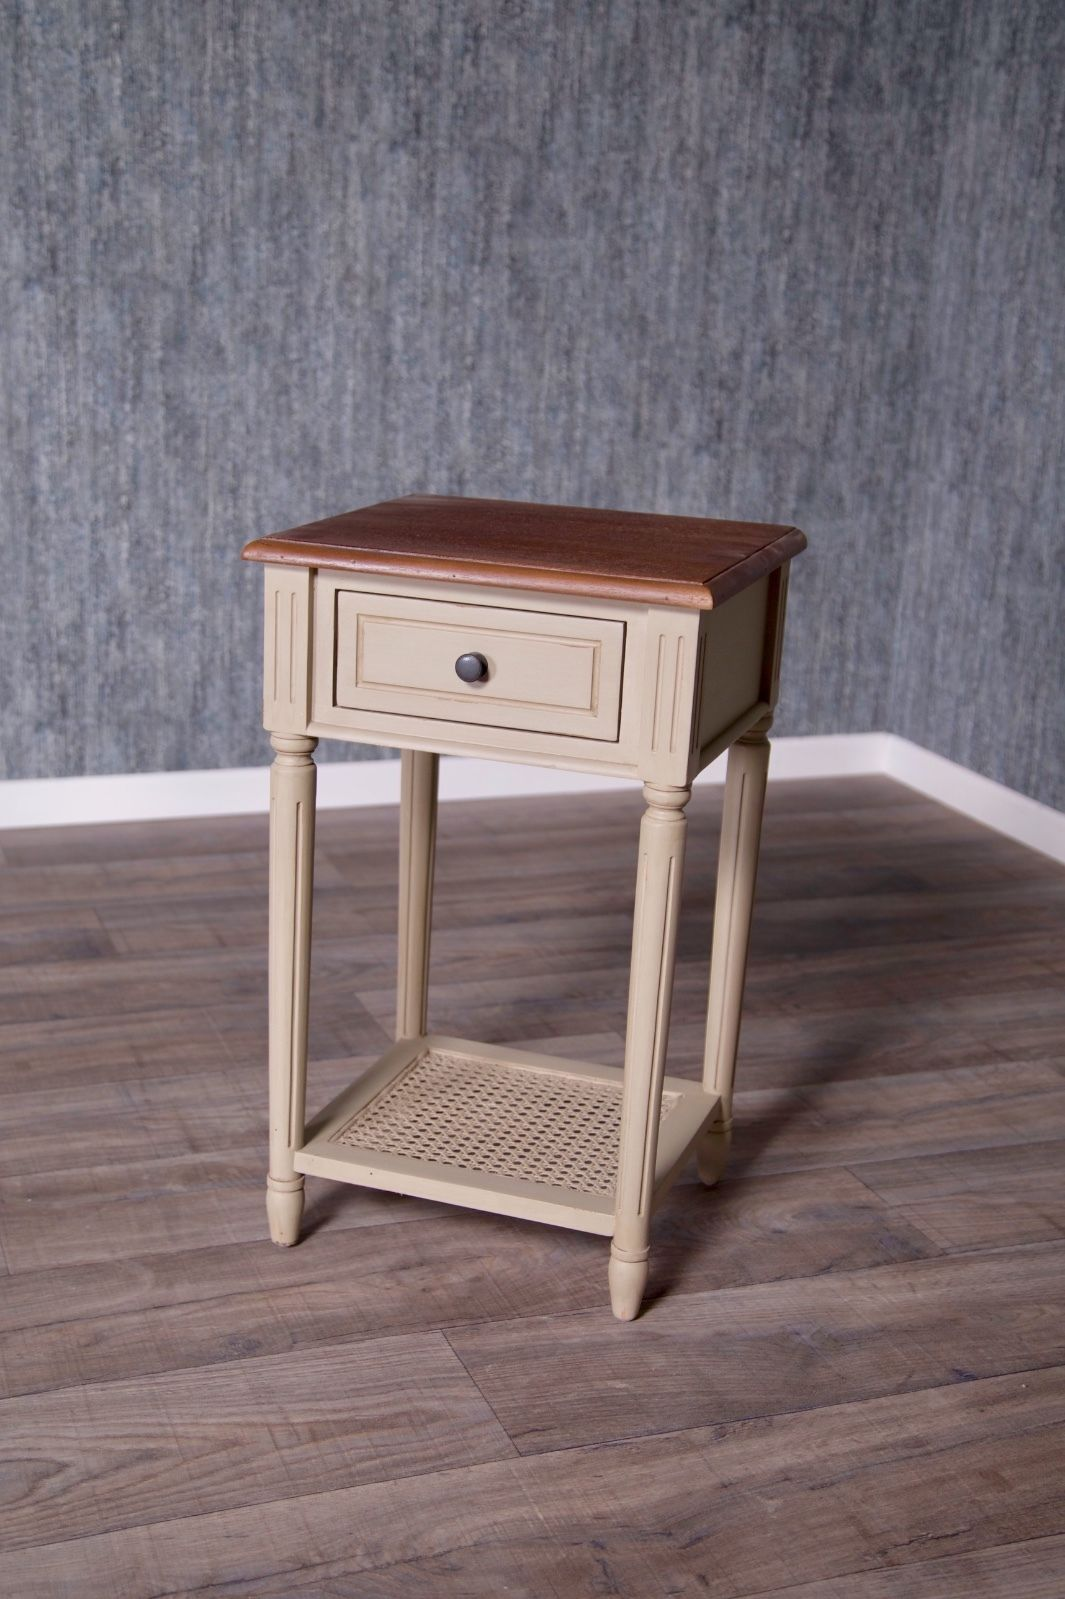 barock nachttisch loi rattan nachttische shop repro. Black Bedroom Furniture Sets. Home Design Ideas